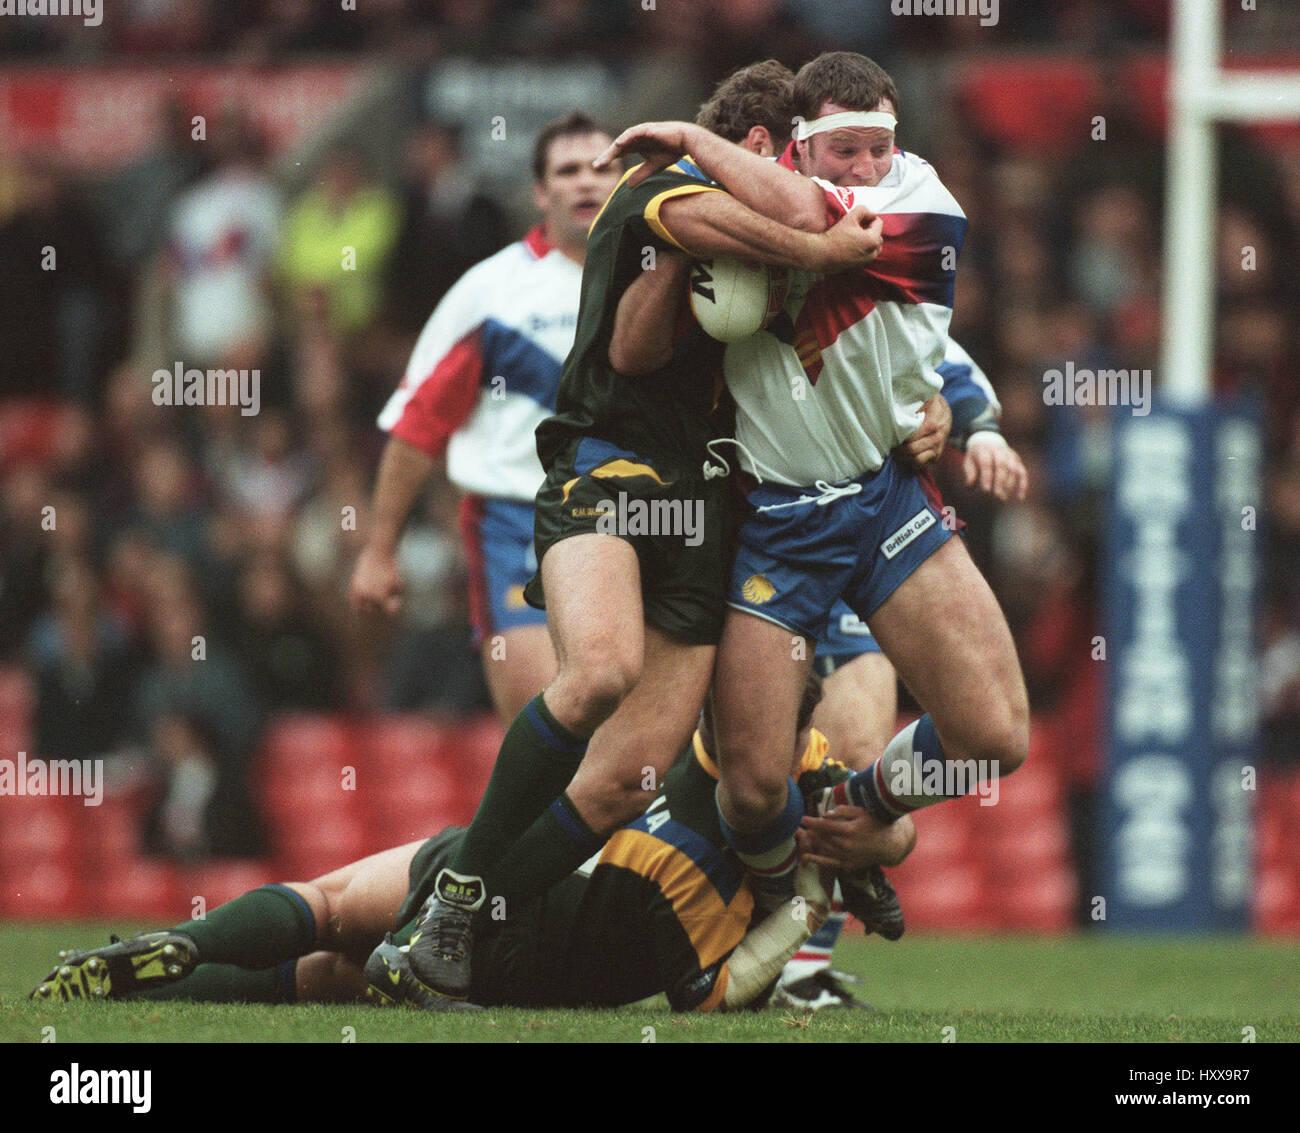 PAUL BROADBENT TALLIS STEVENS GREAT BRITAIN V AUSTRALIA 10 November 1997 - Stock Image